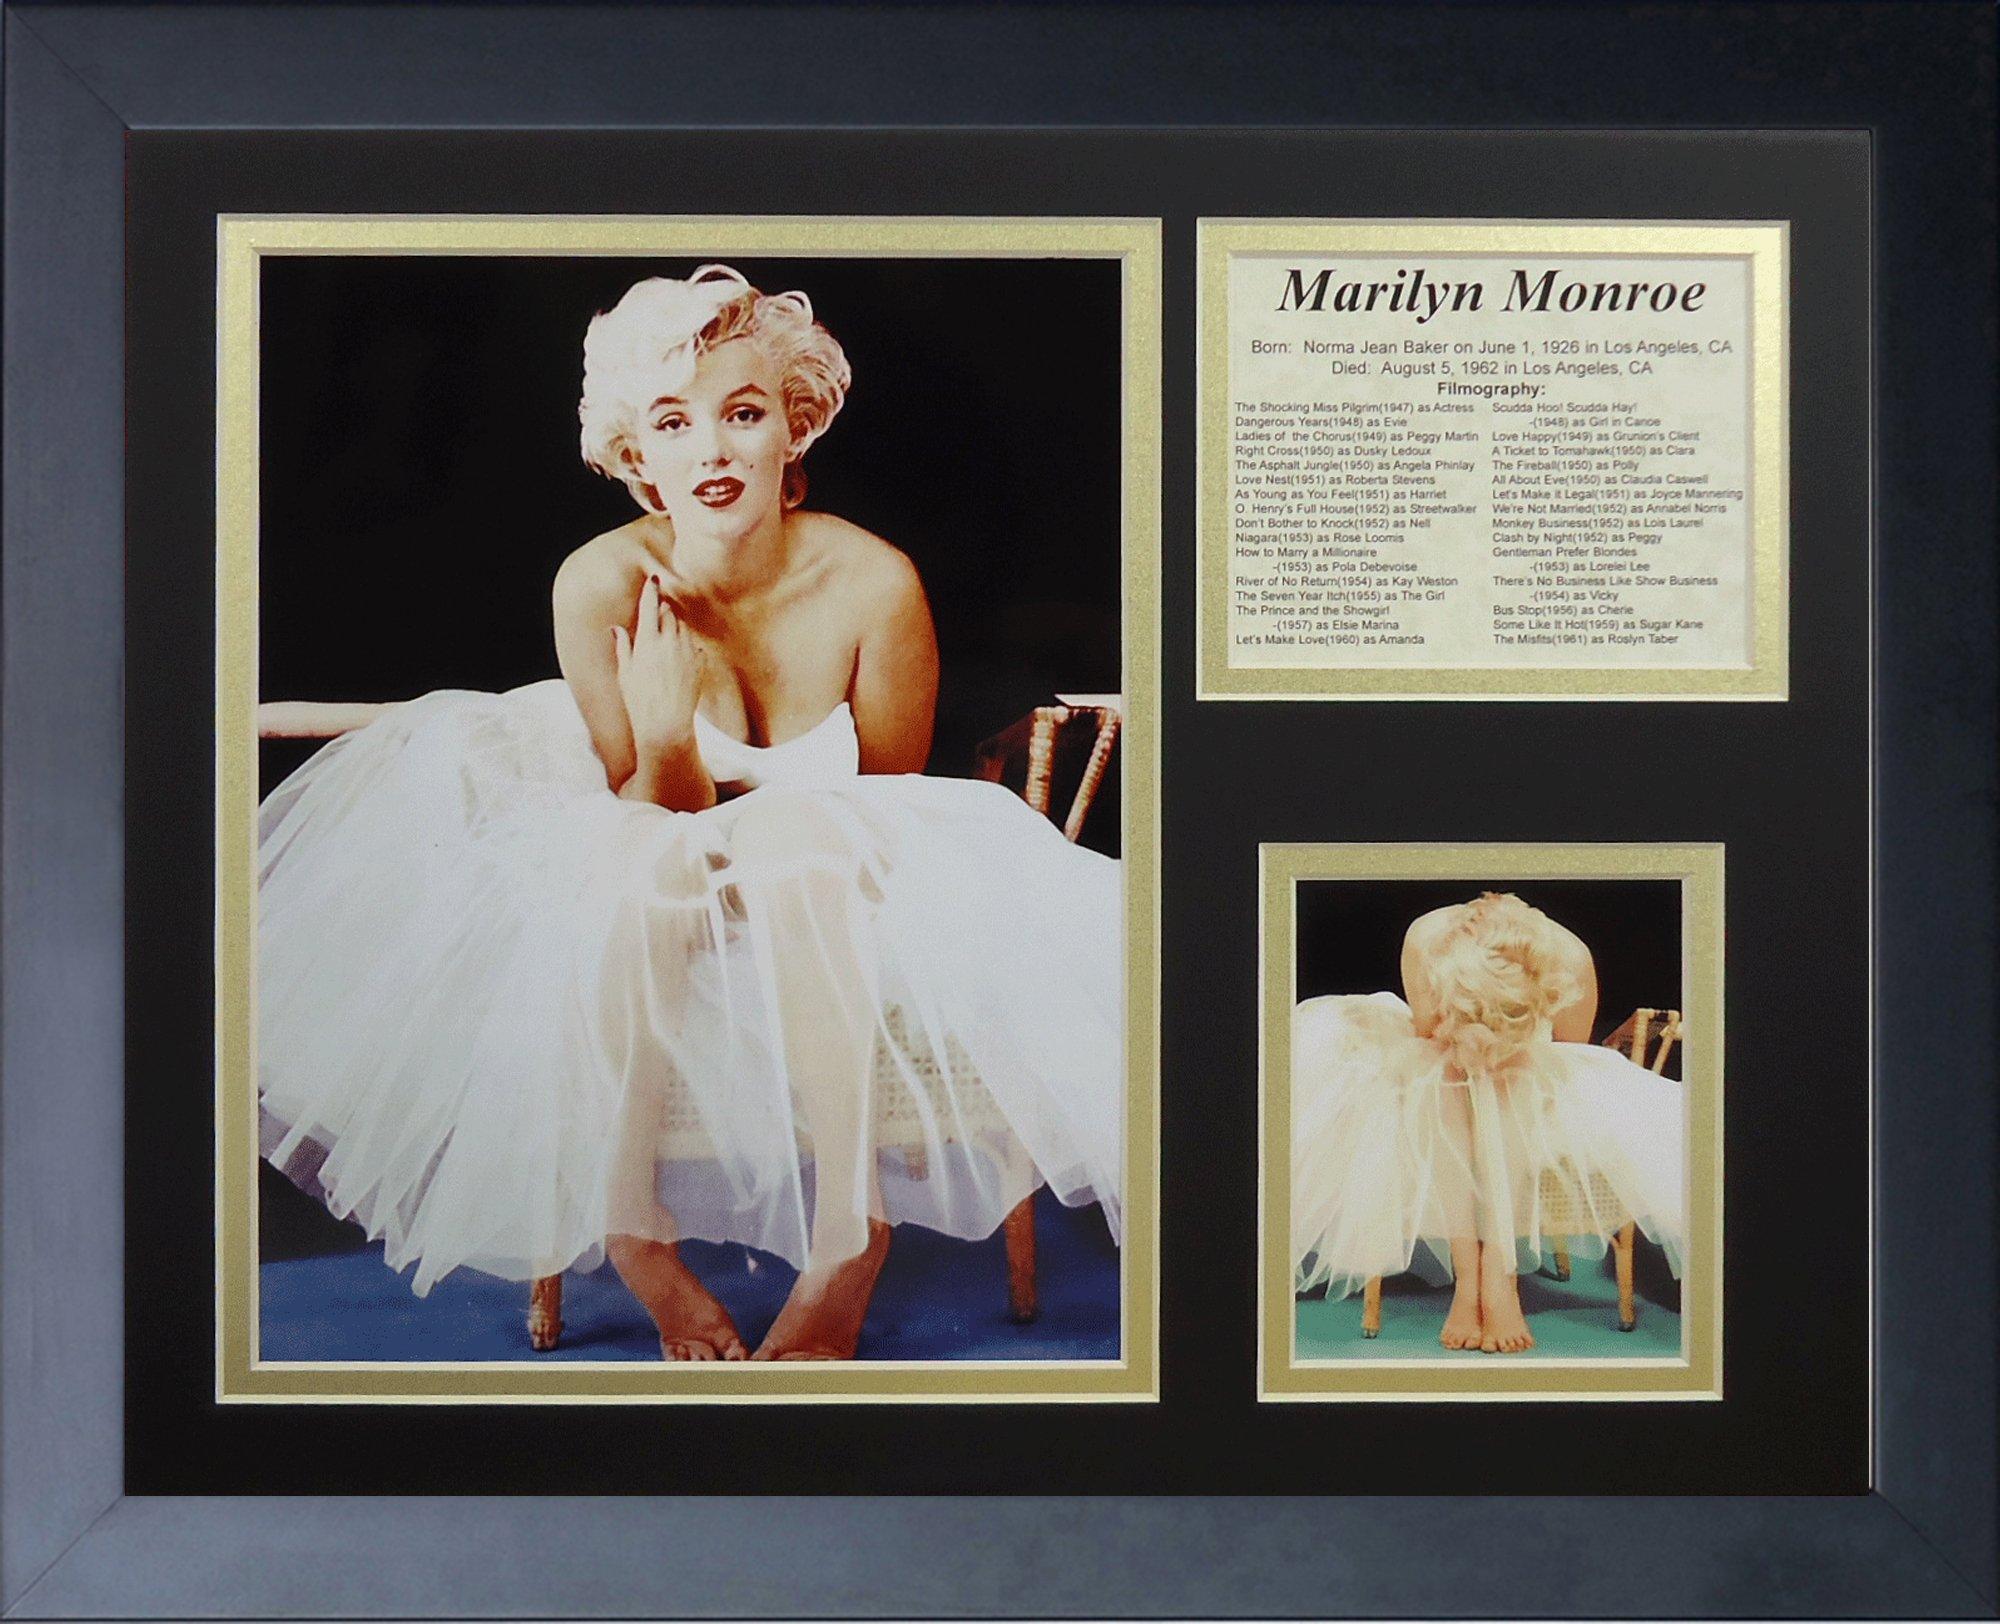 Legends Never Die Marilyn Monroe Ballerina Framed Photo Collage, 11x14-Inch by Legends Never Die